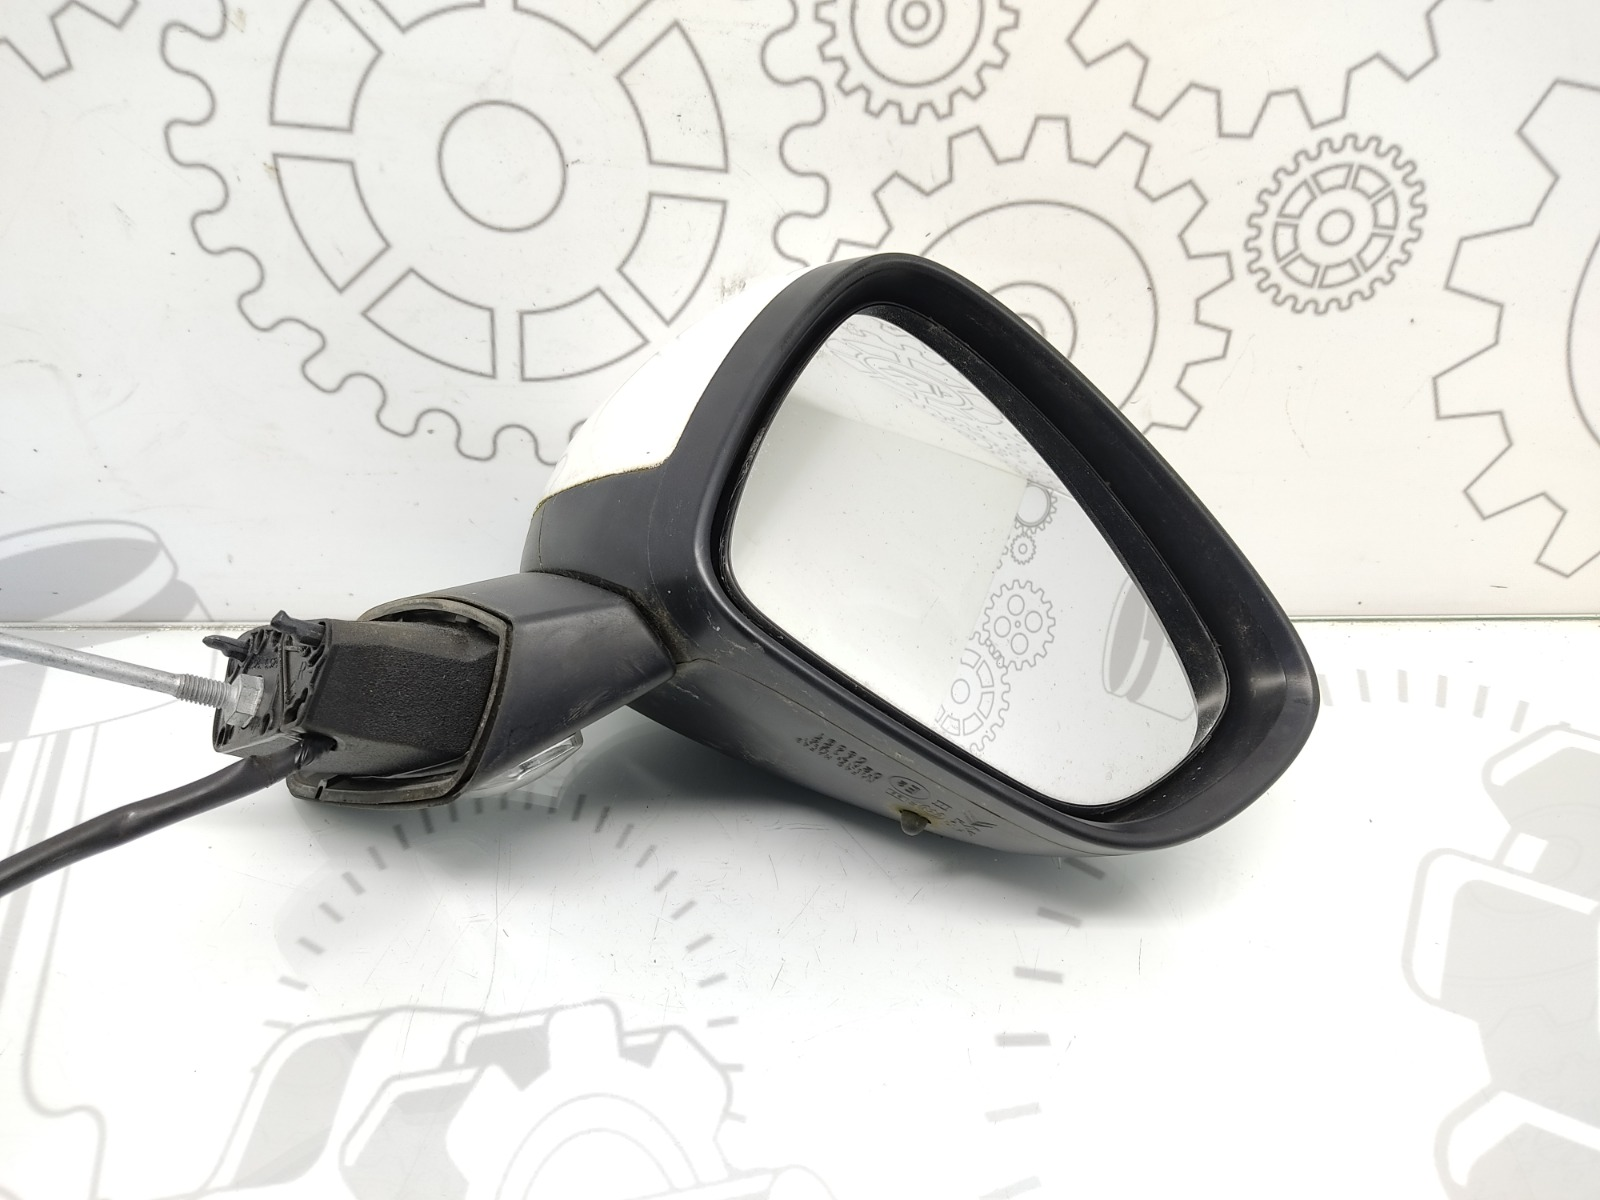 Зеркало наружное правое Citroen C3 1.4 I 2012 (б/у)